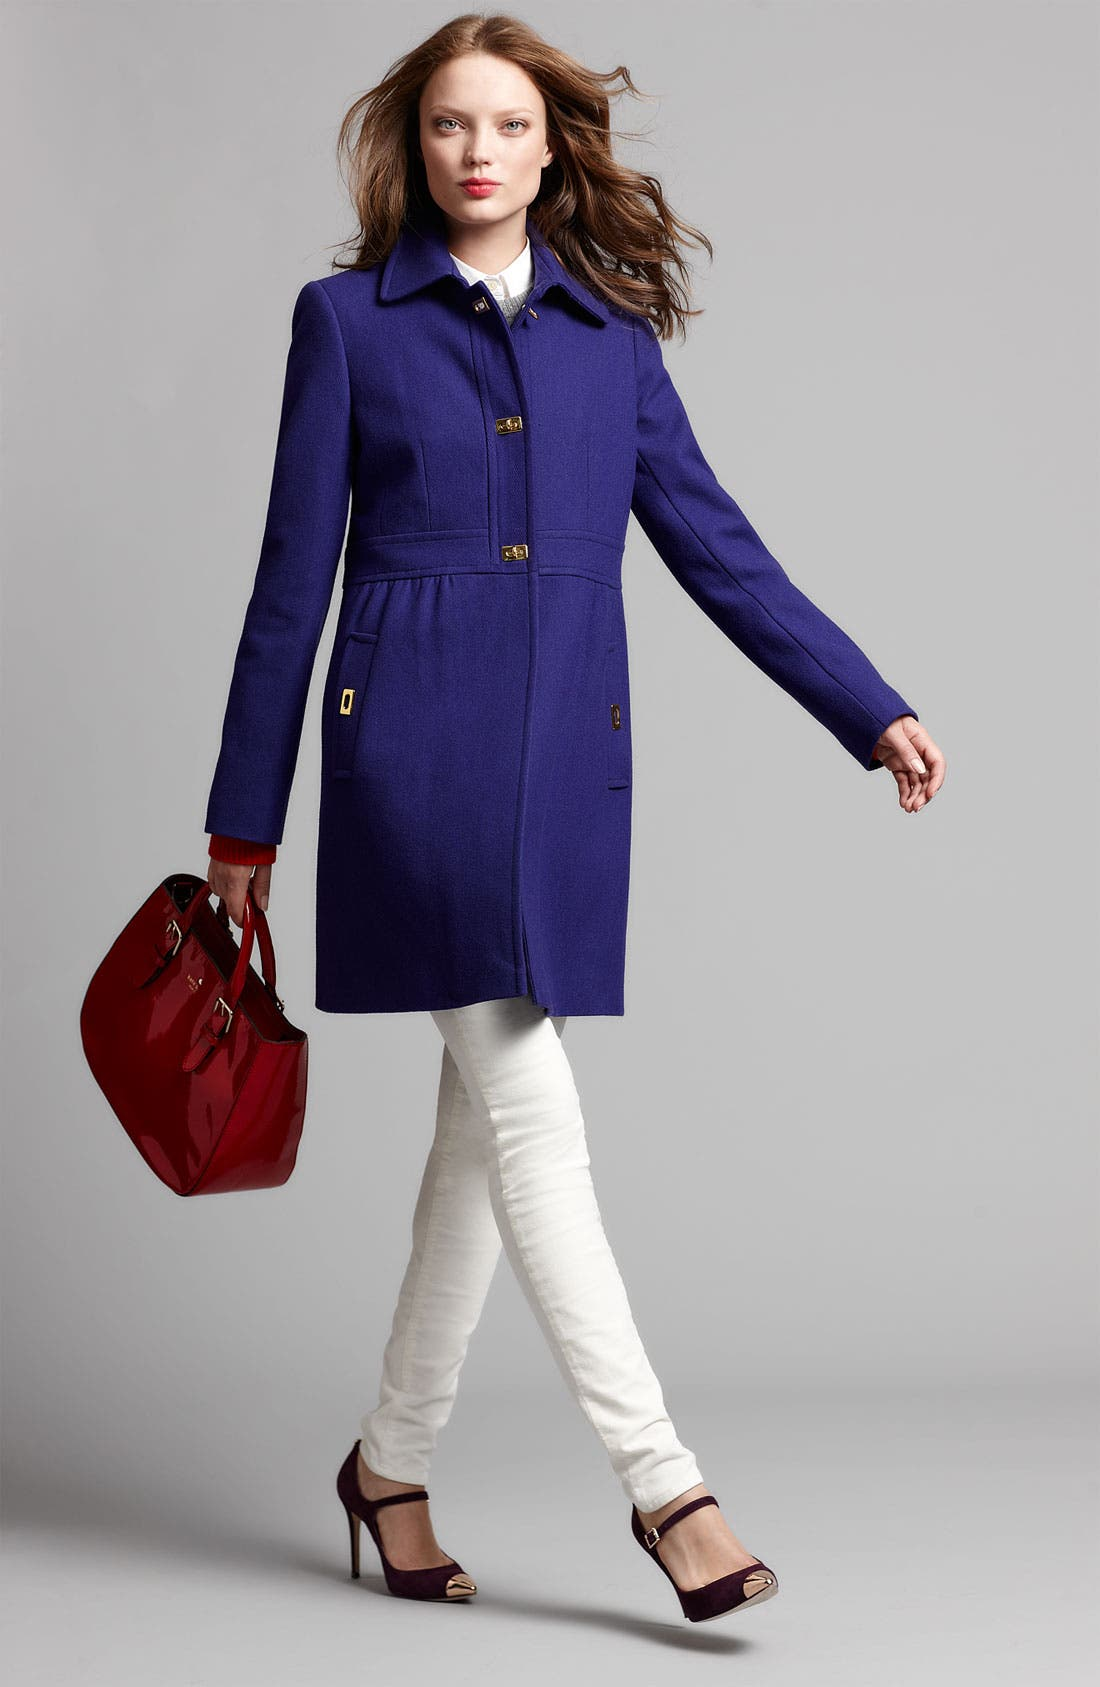 Alternate Image 2  - DKNY Turnkey Coat & KUT from the Kloth Corduroy Pants